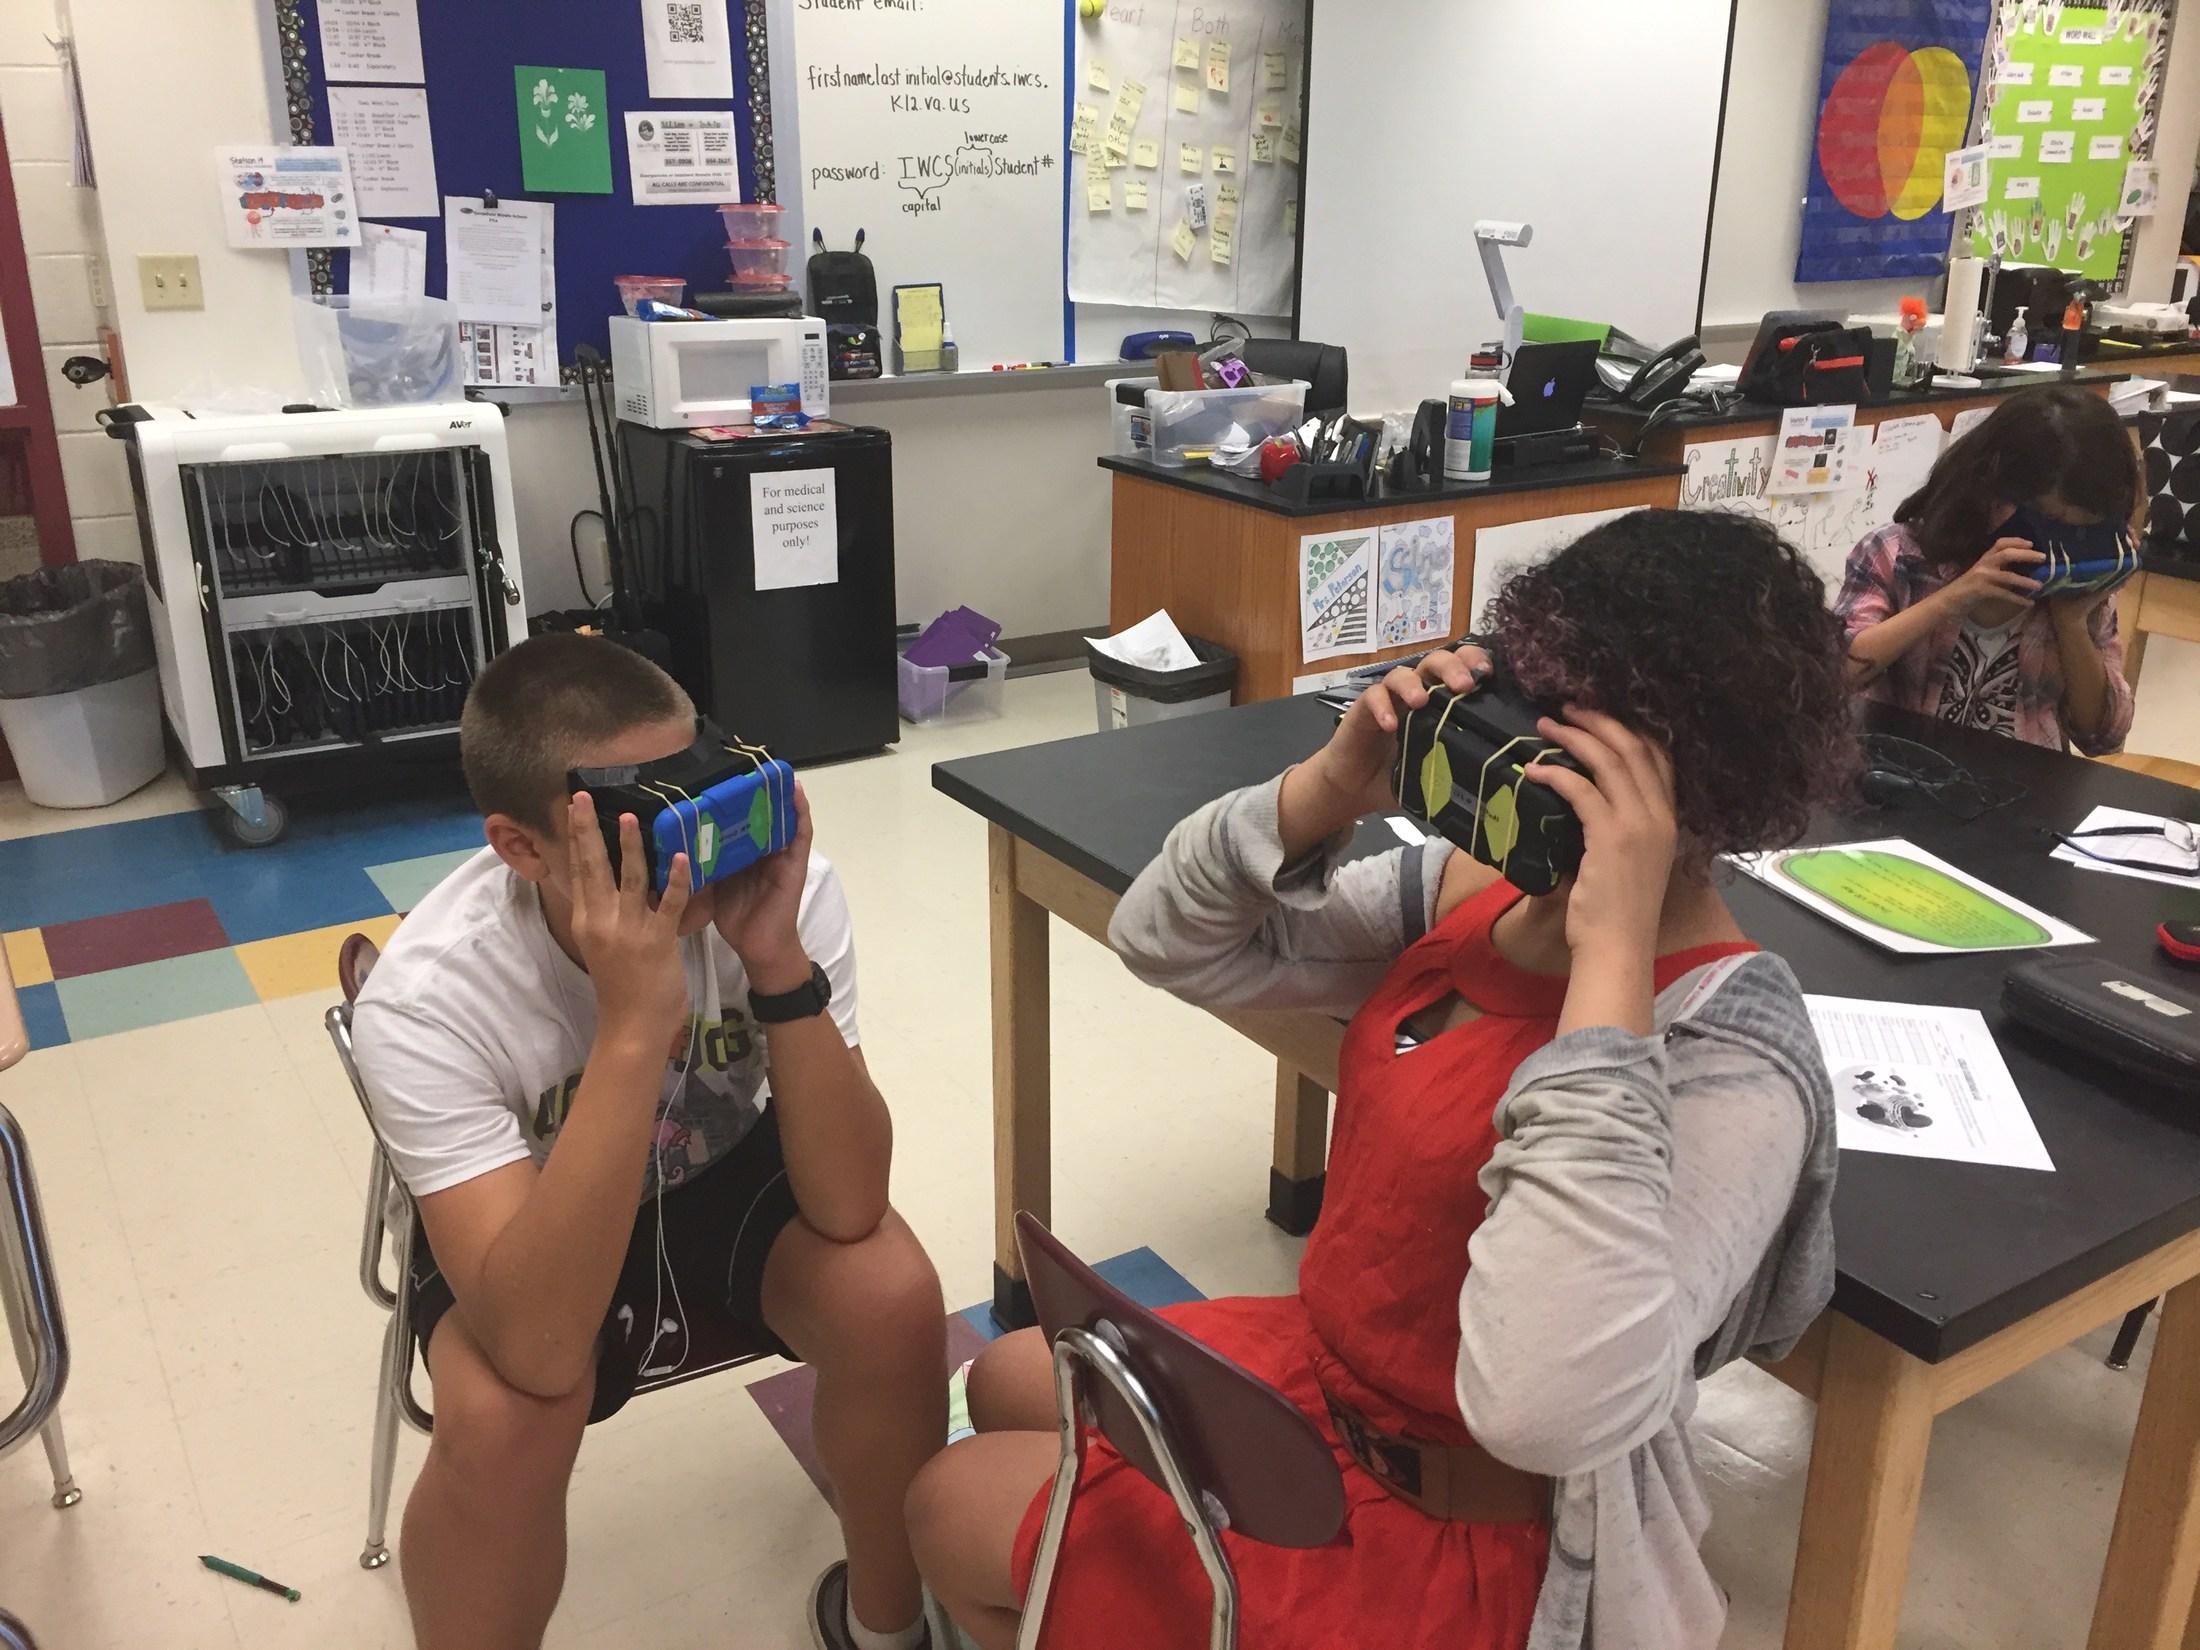 Virtual reality exploration